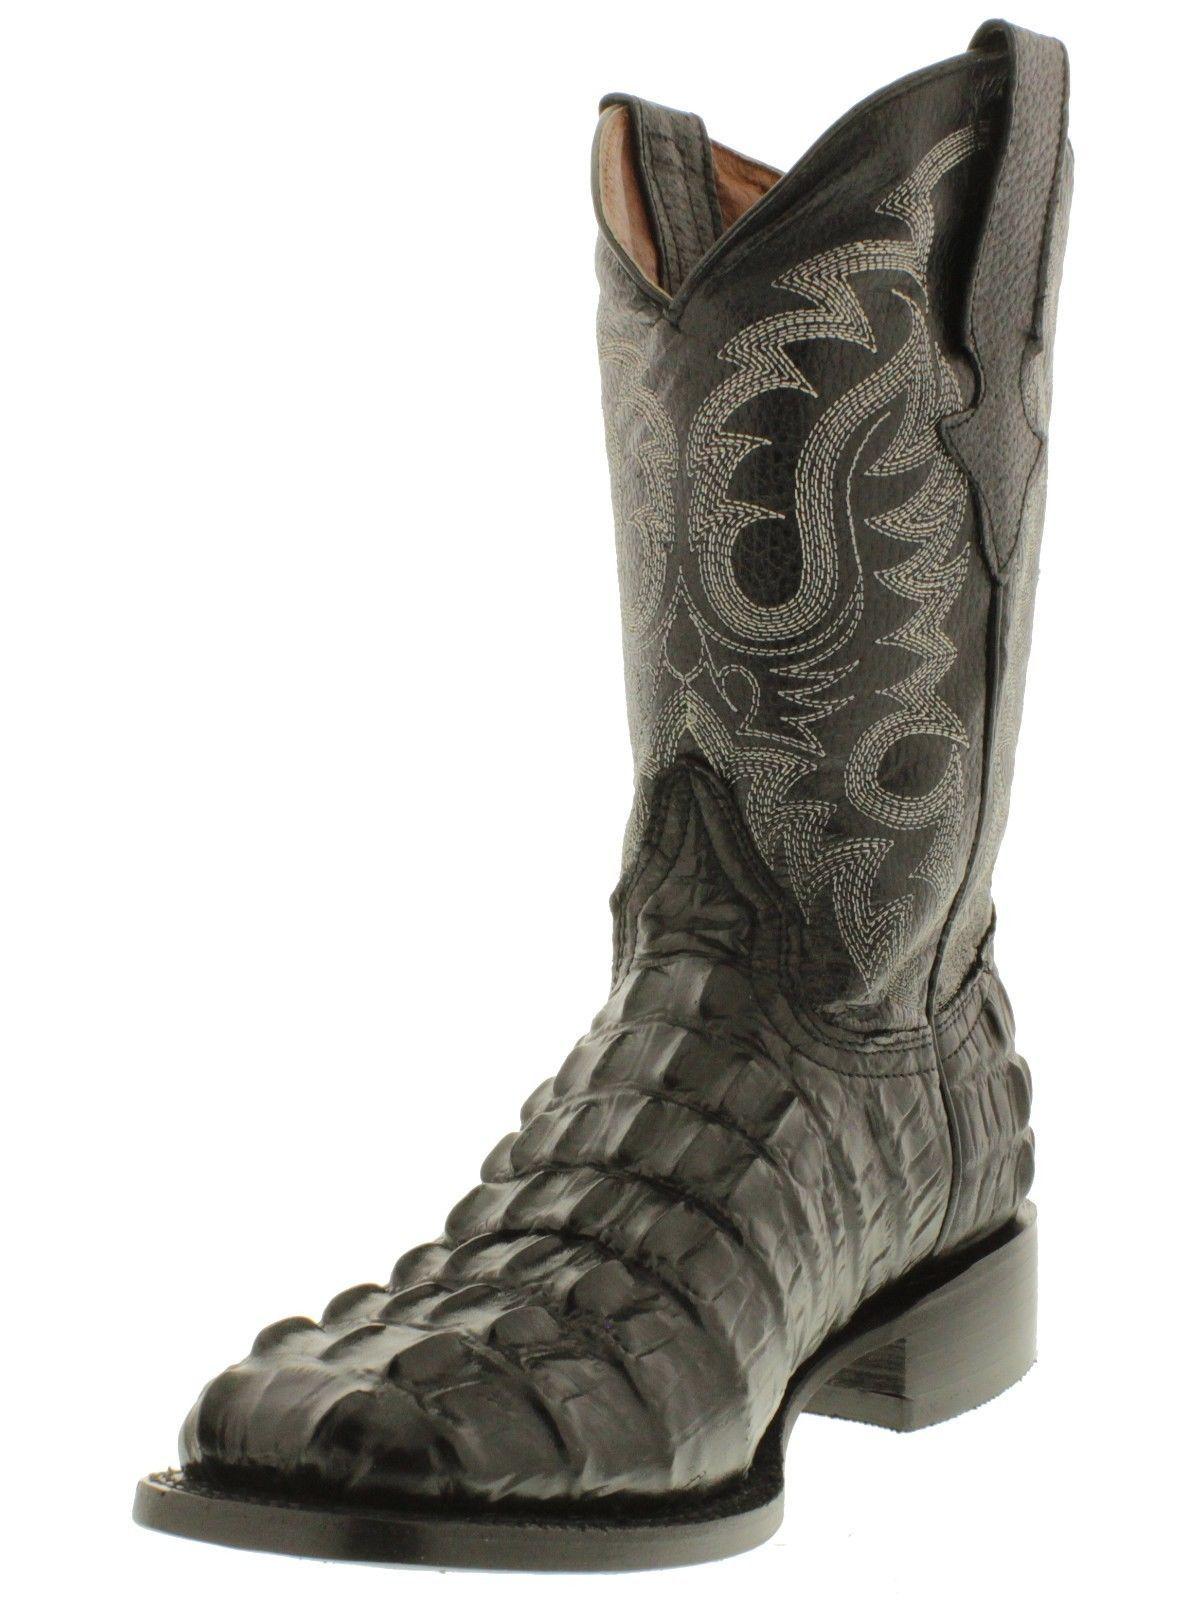 Belt Crocodile Alligator Tail Cut Design Embossed Leather Cowboy Western Brown